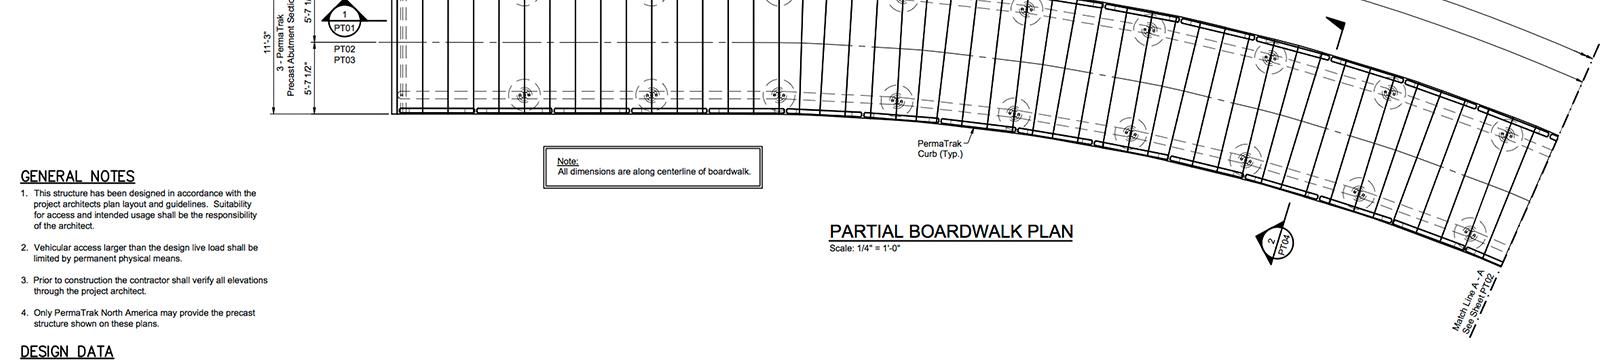 boardwalk_pedestrian_bridge_design.jpg